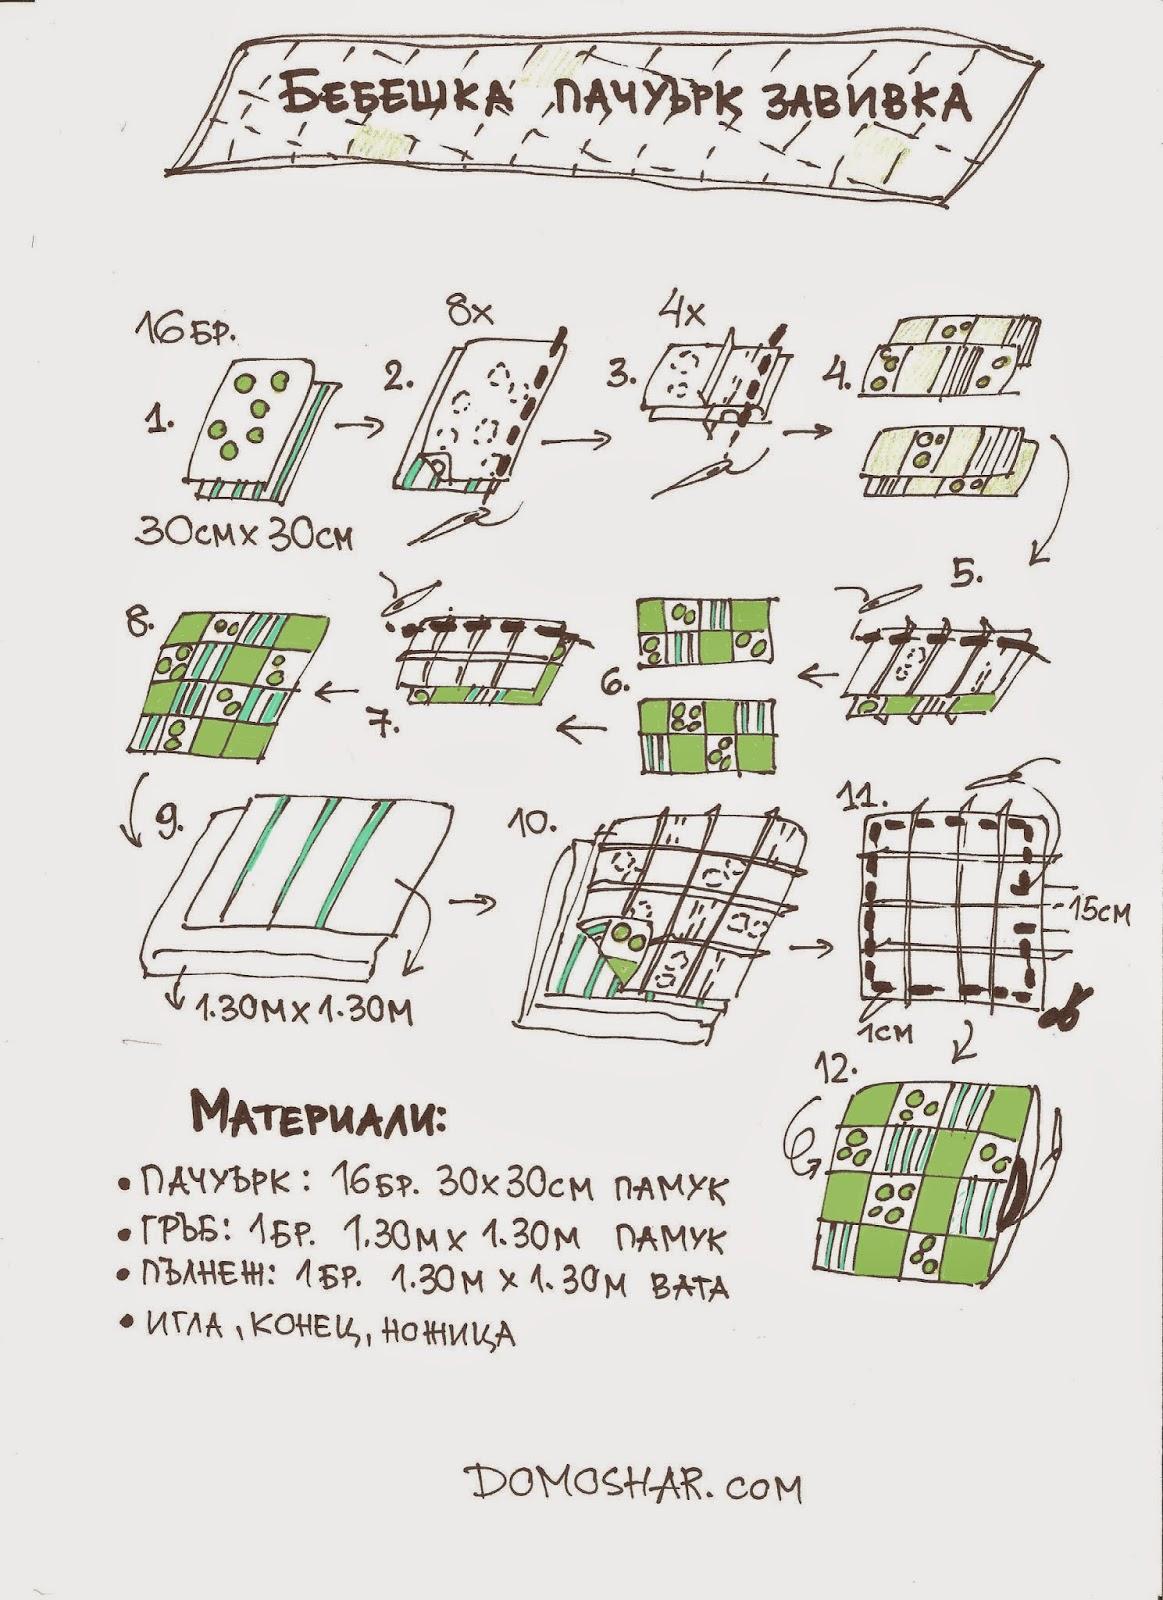 пачуърк урок онлайн: Пачуърк завивка от квадрати с Домошар